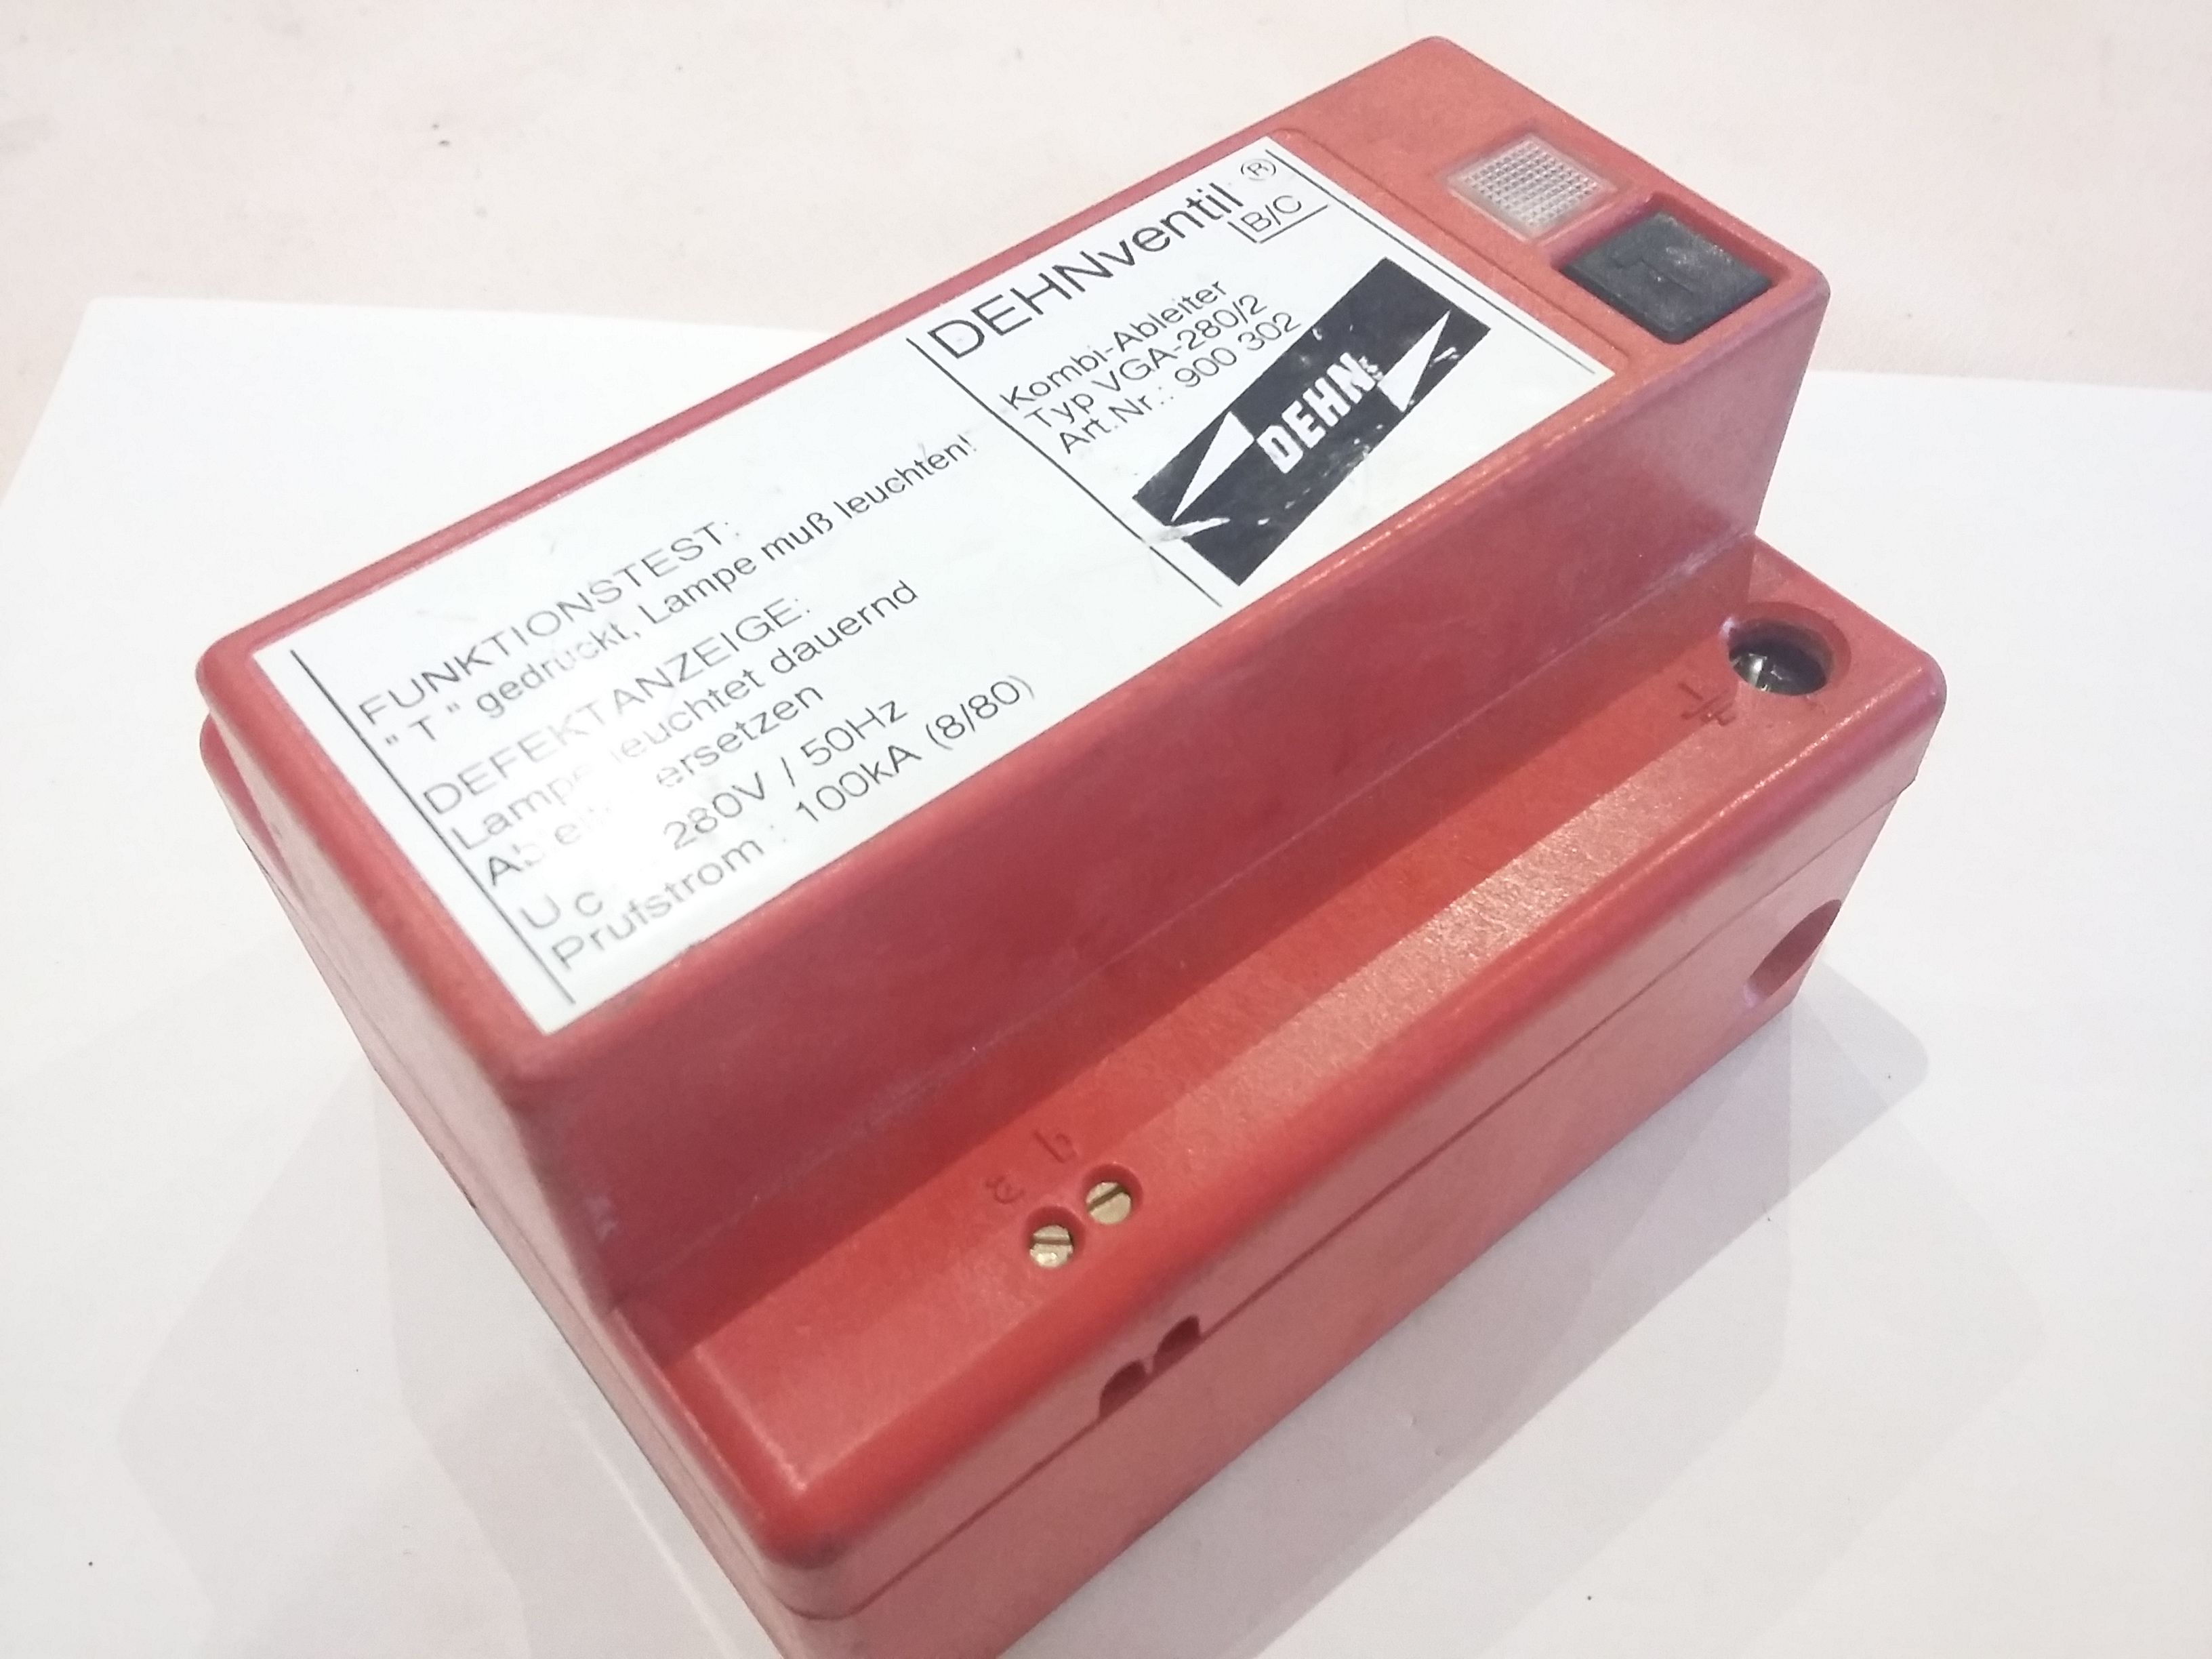 DEHNVENTIL b/c Kombi ableiter vga-280 / 2 900 302 280 V 100 ka ...